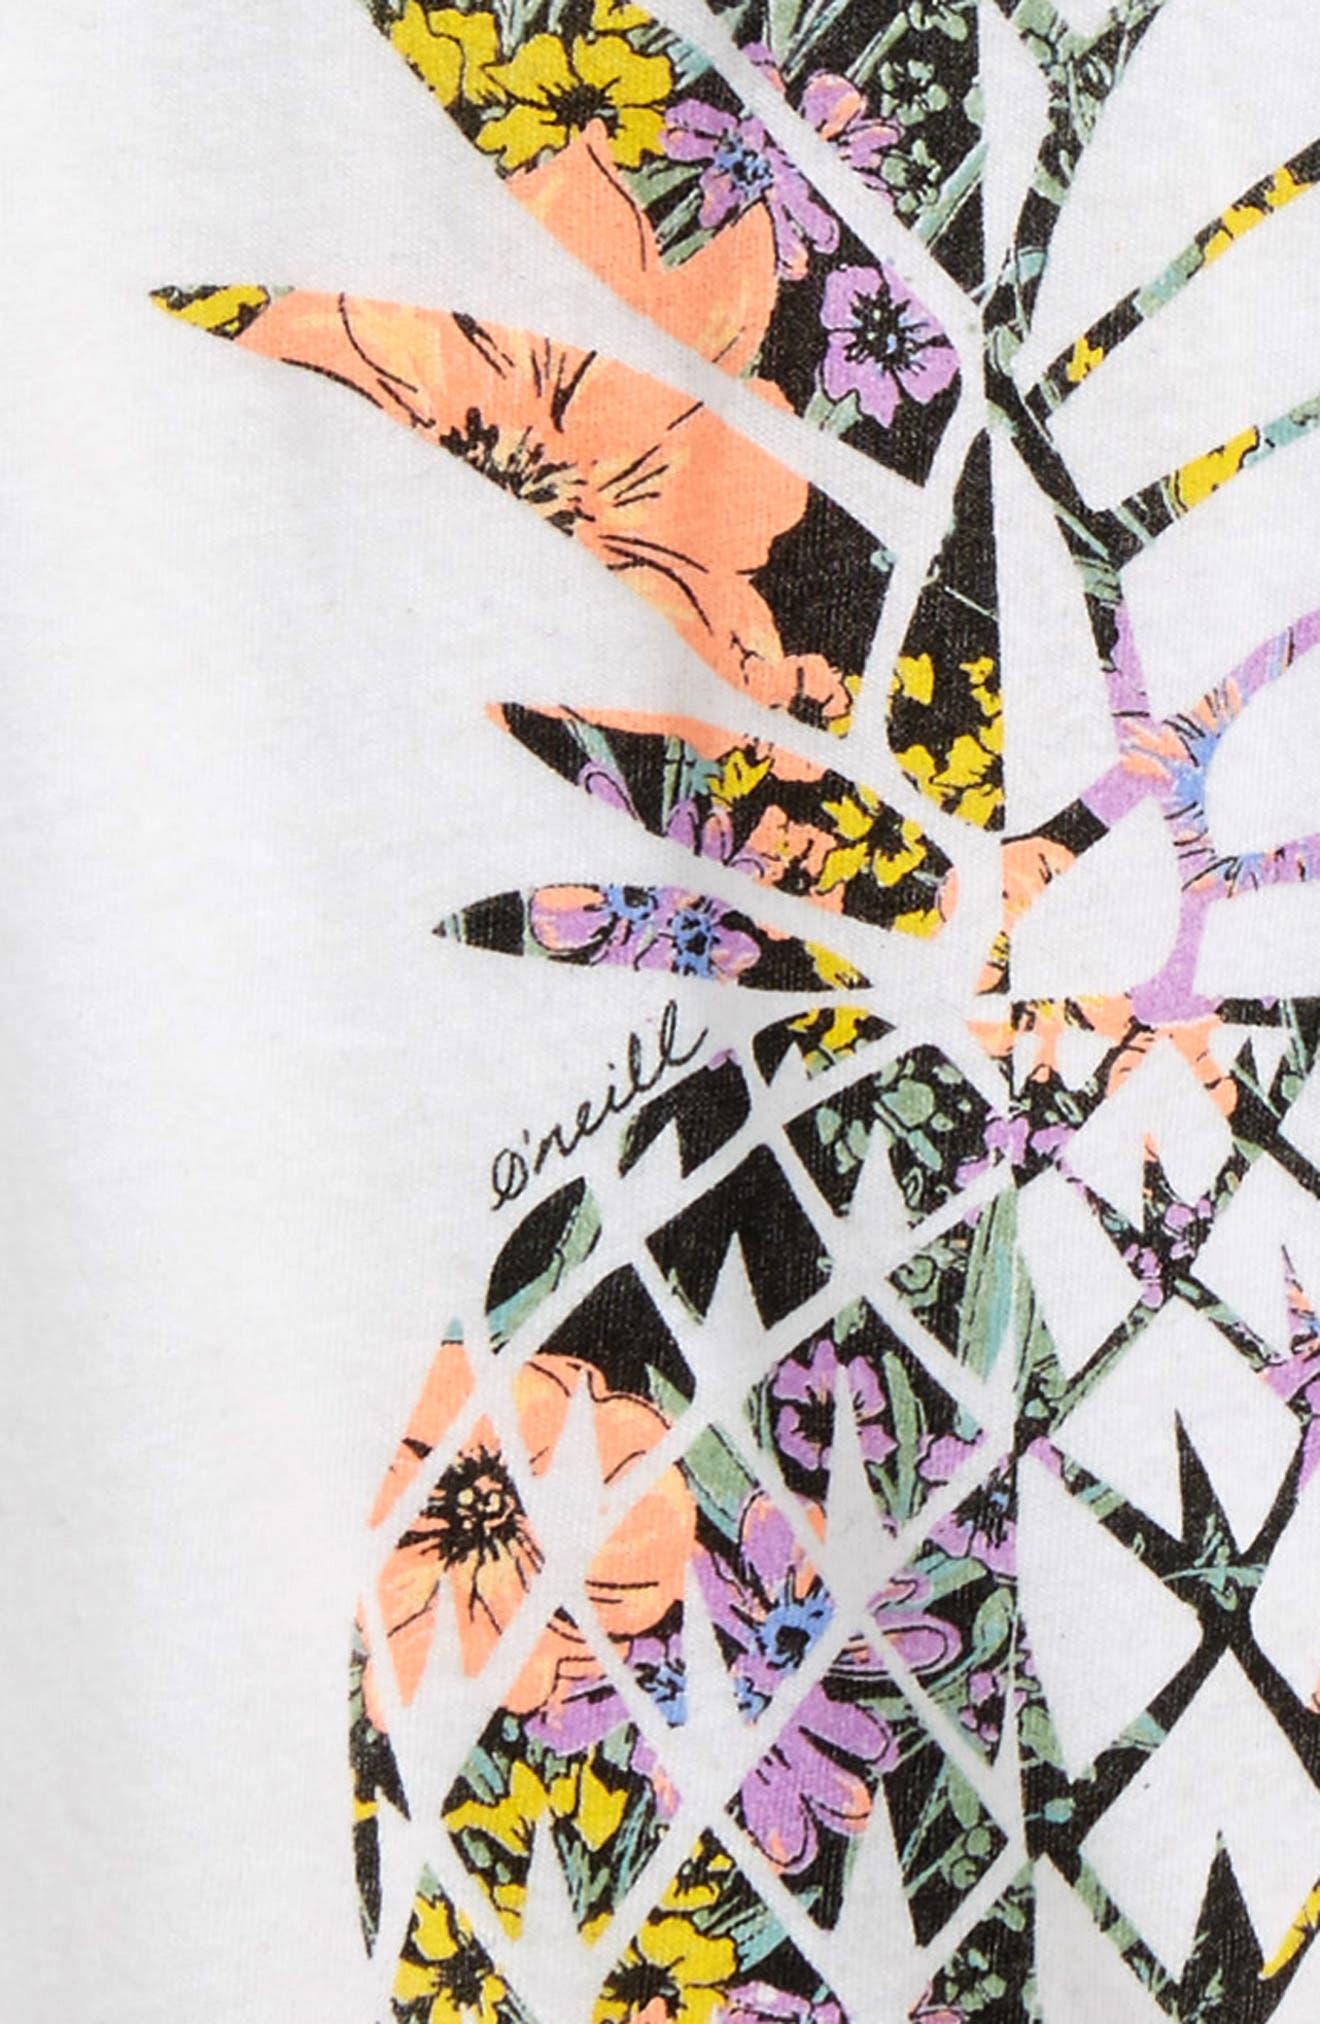 Pineapple Garden Graphic Tee,                             Alternate thumbnail 3, color,                             White - Wht